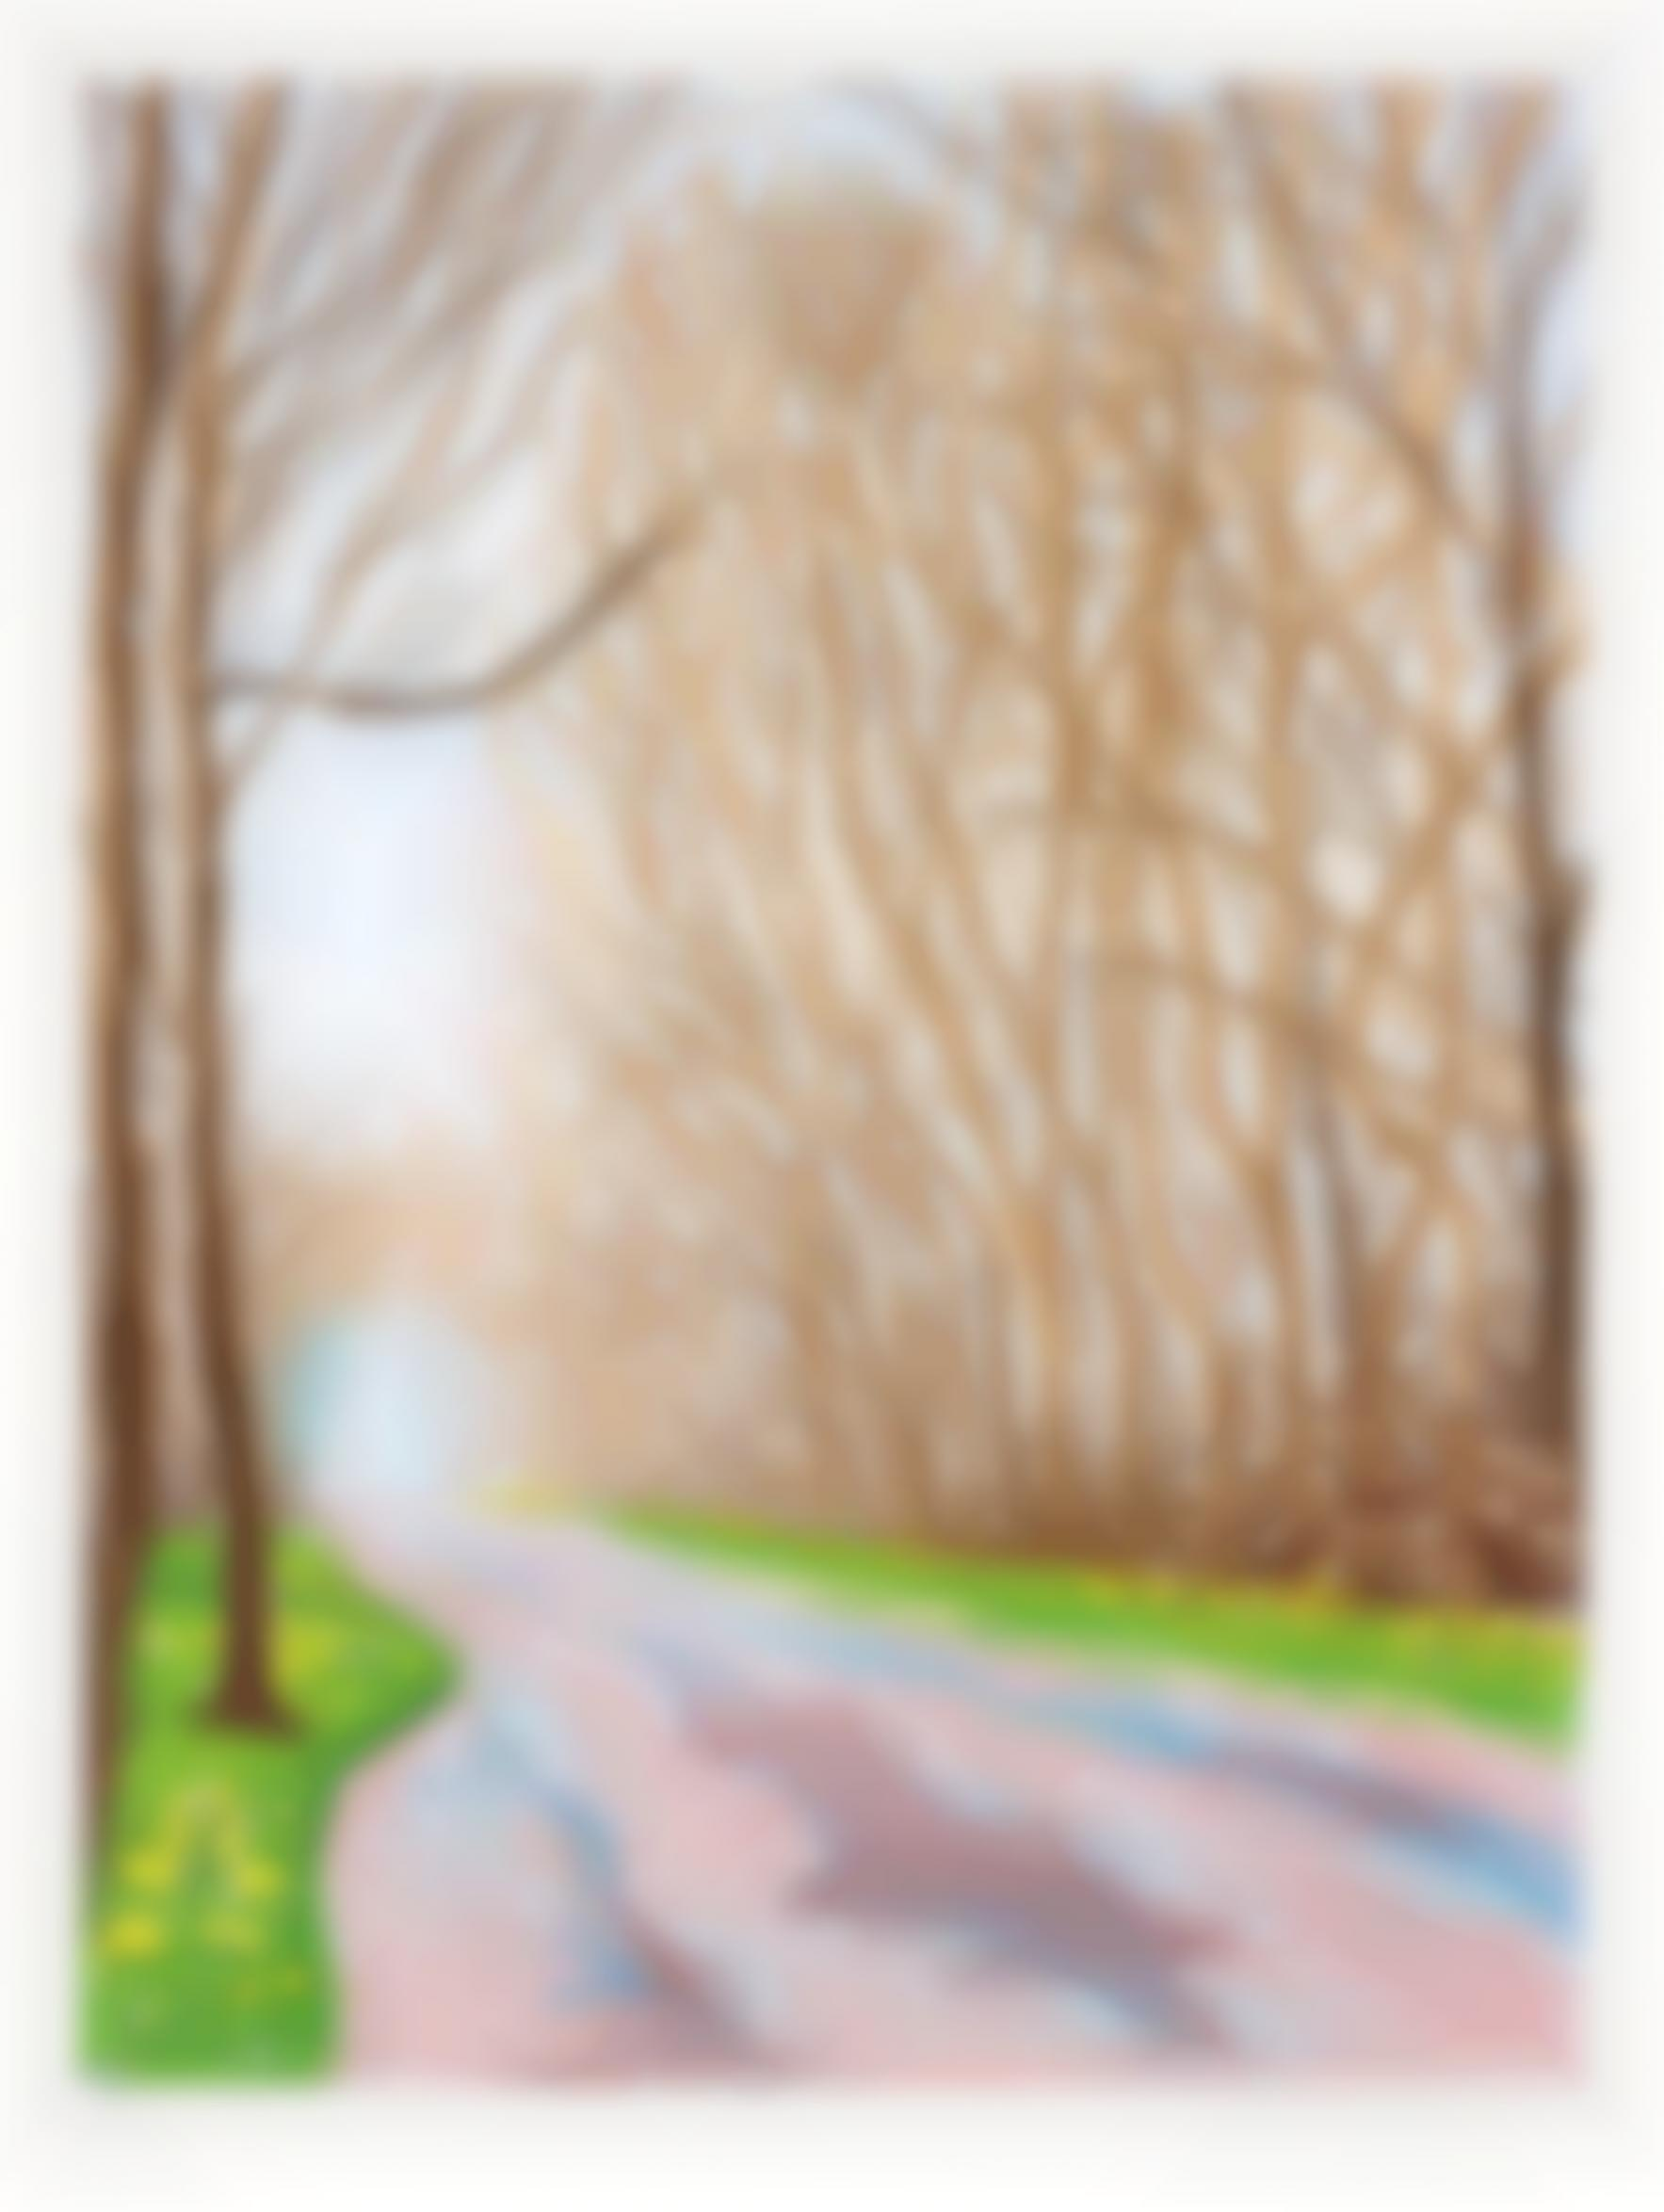 David Hockney-1 April, from The Arrival of Spring in Woldgate, East Yorkshire in 2011 (twenty eleven)-2011